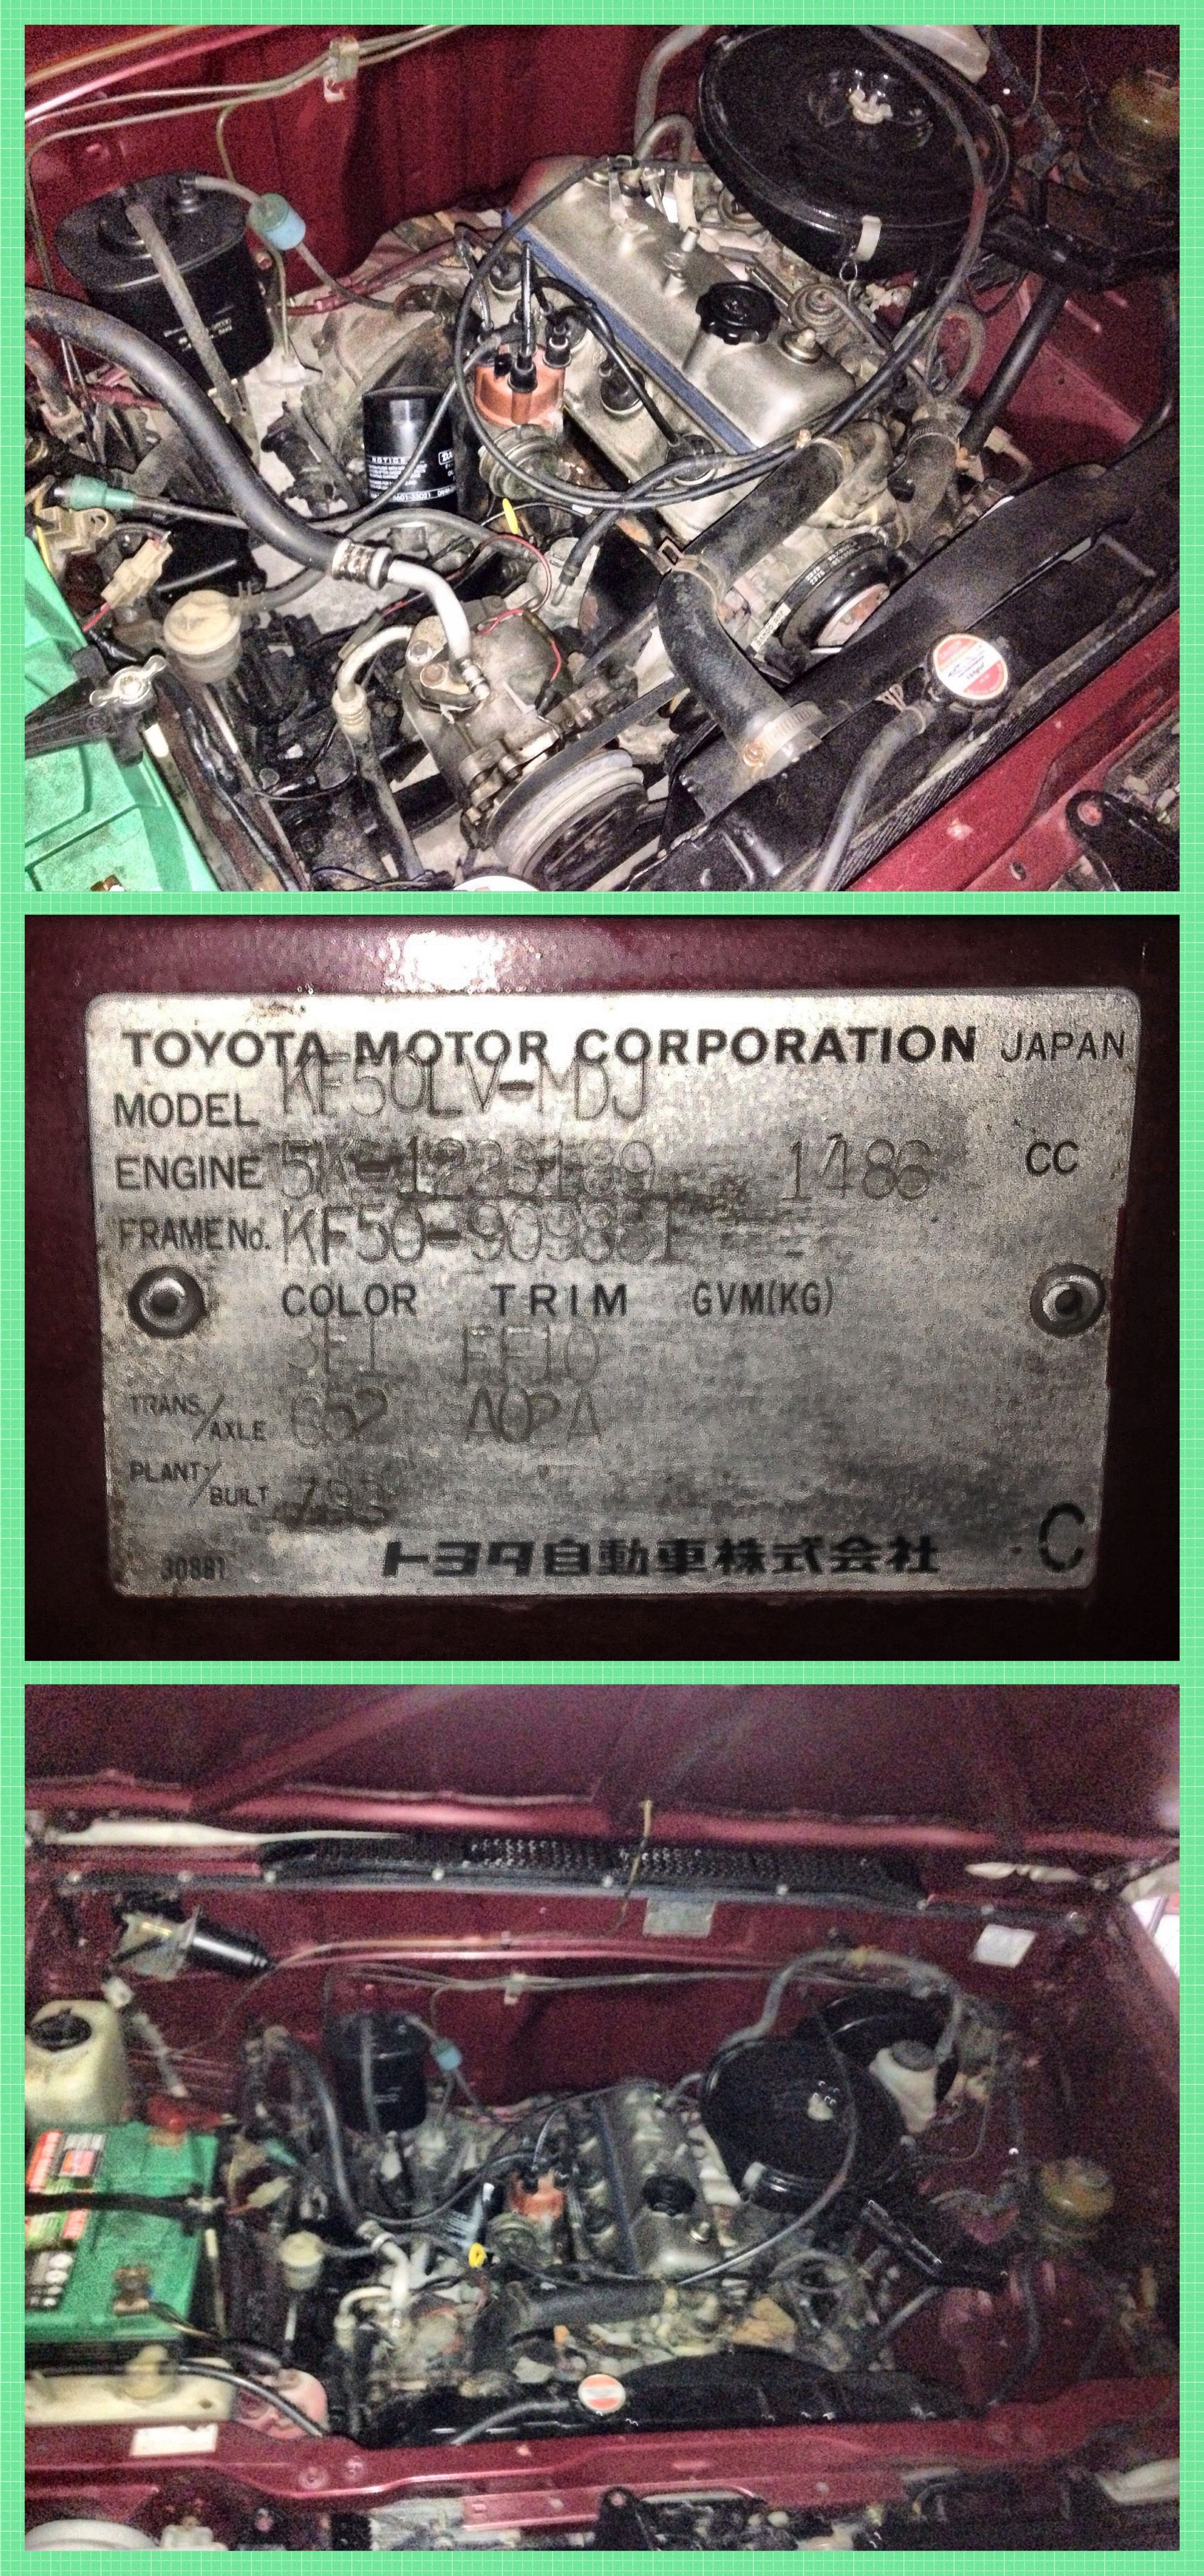 medium resolution of 1995 toyota tamaraw fx with a 5k gasoline engine